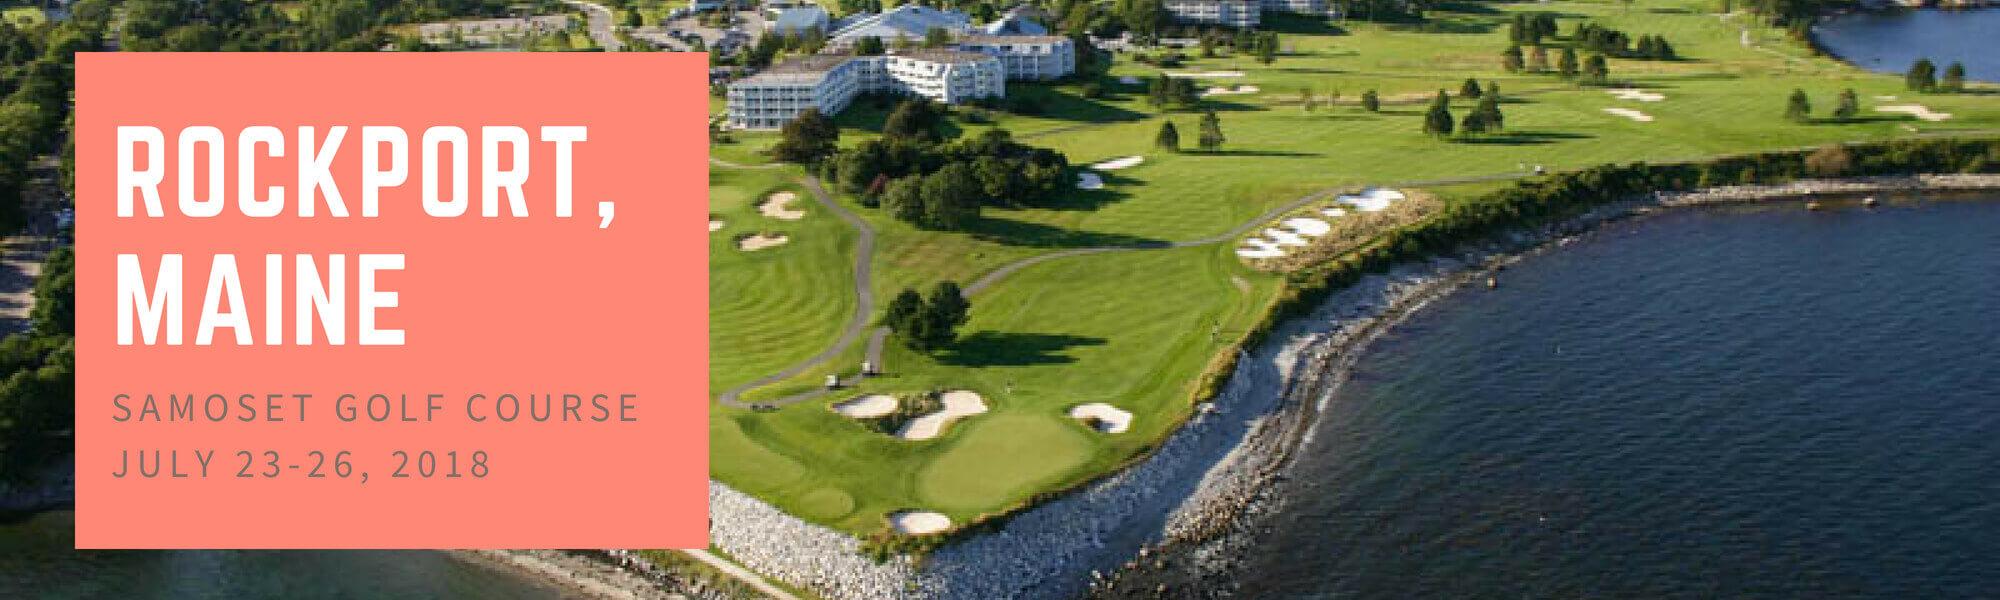 Lobster Festival golf tournament - Senior Golfers of America